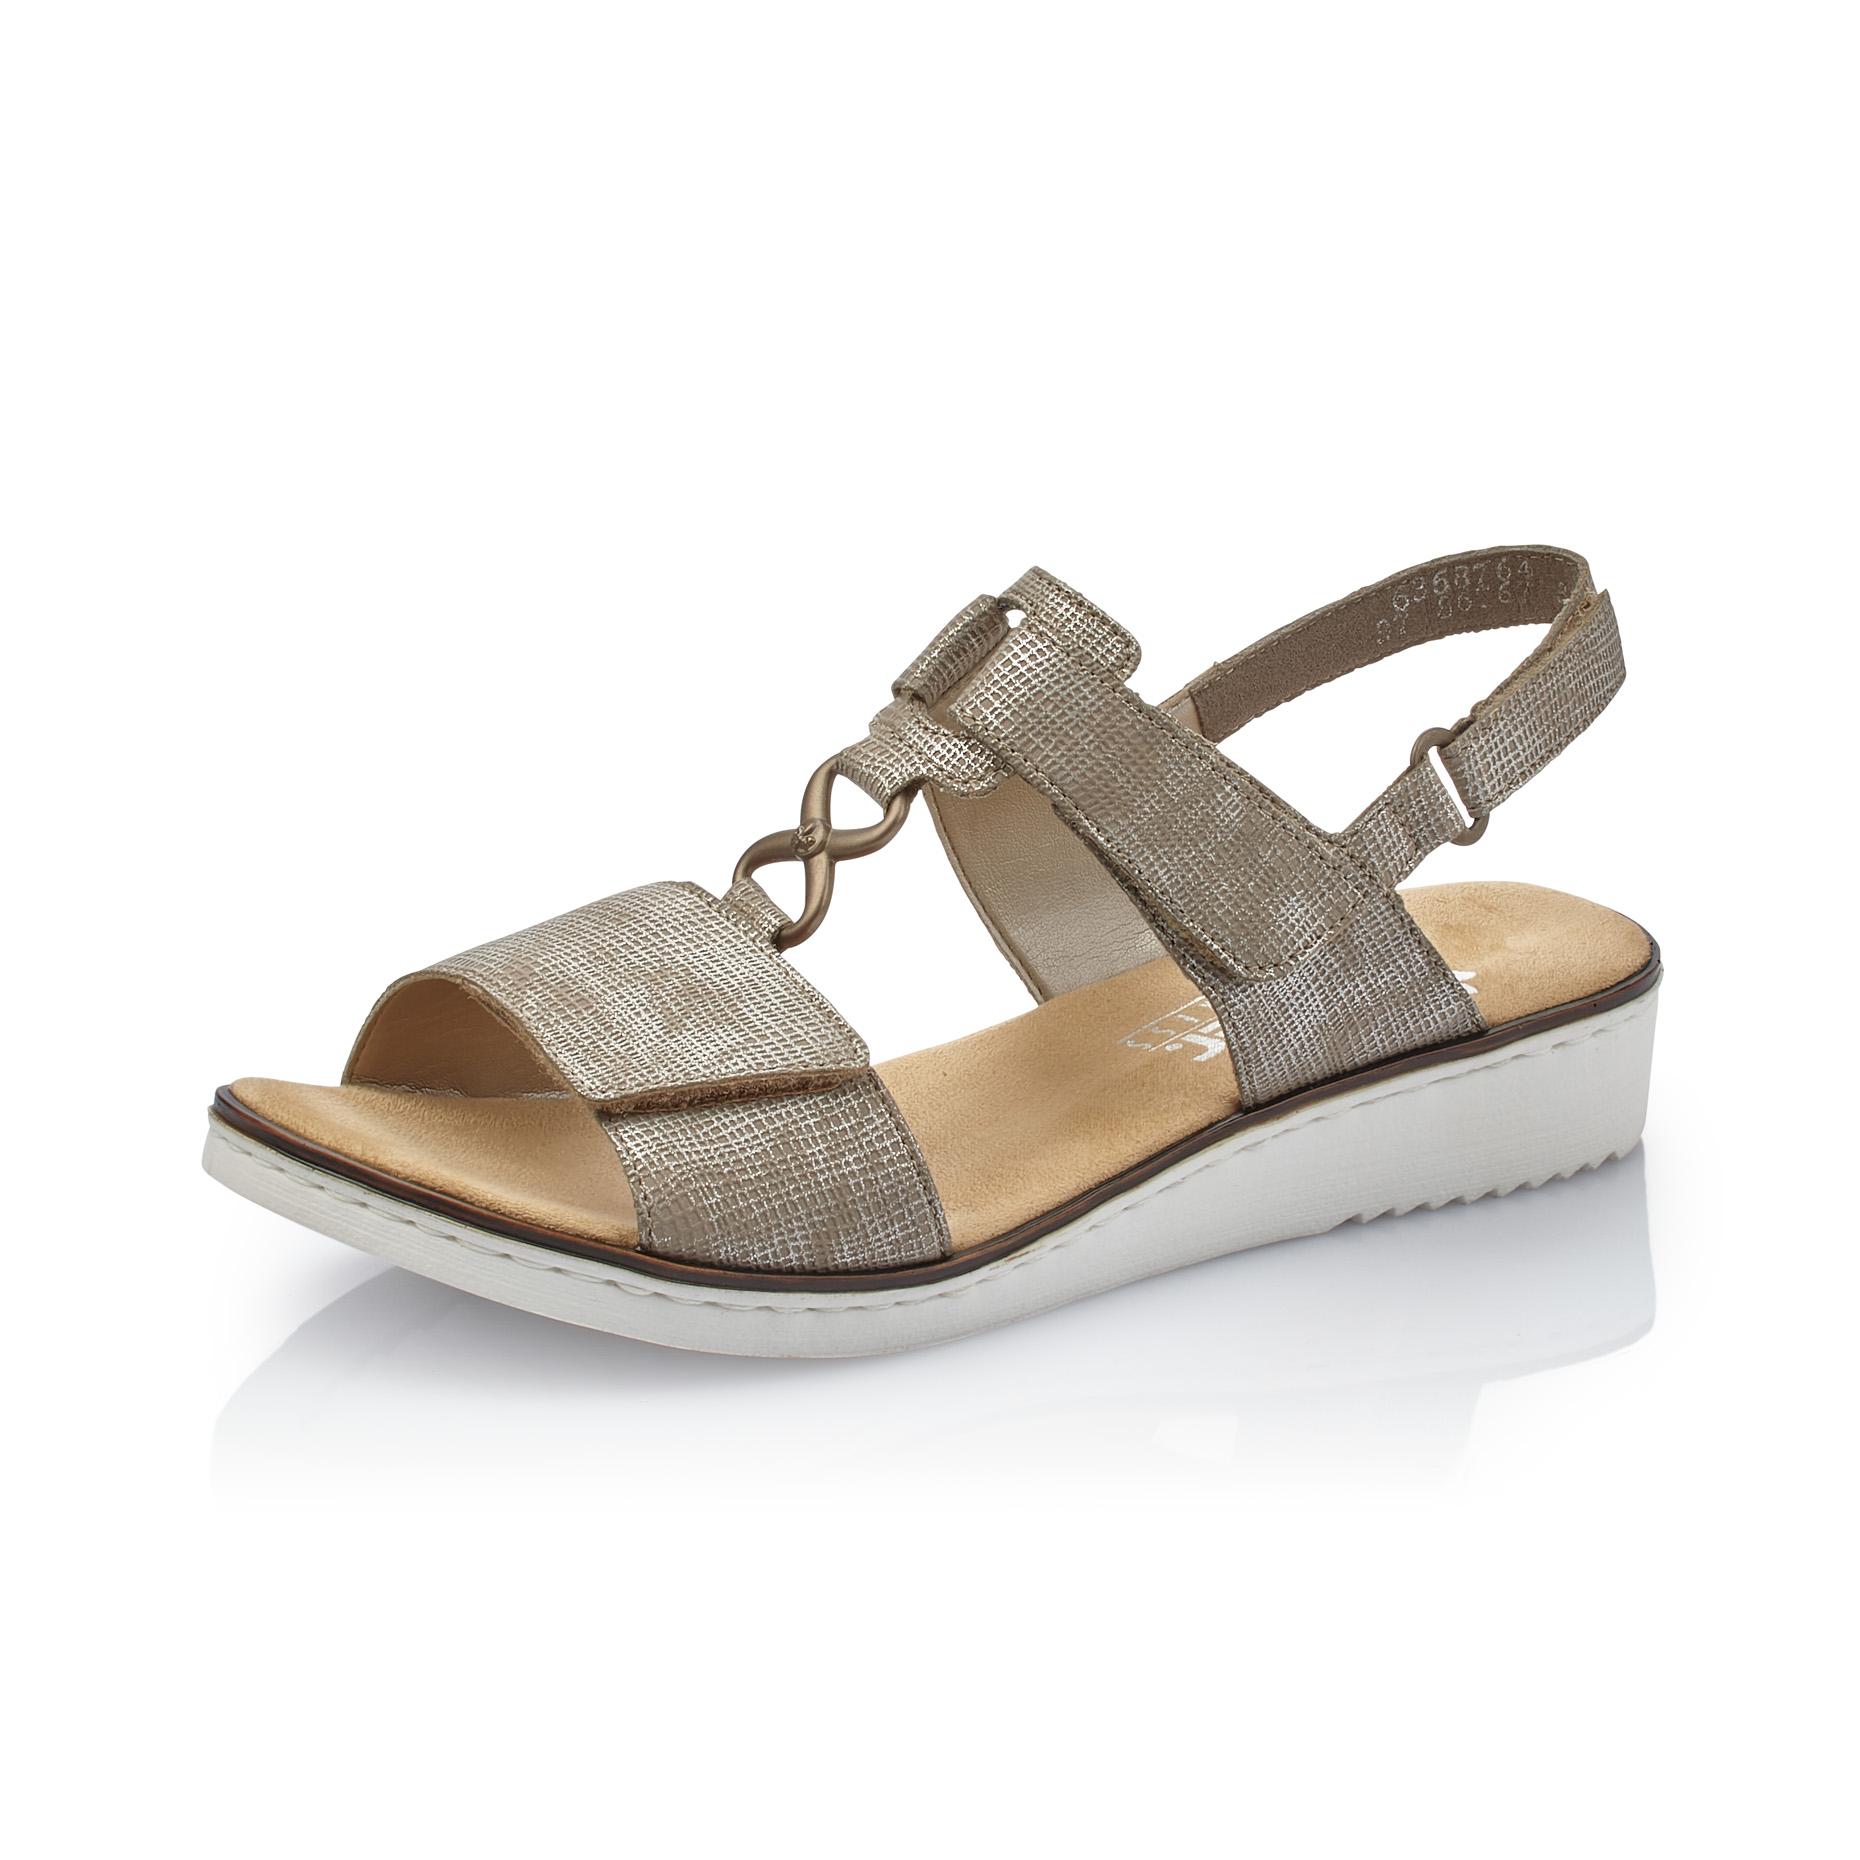 Dámská obuv RIEKER 63687-64 BEIGE F S 9  6dbb747508a